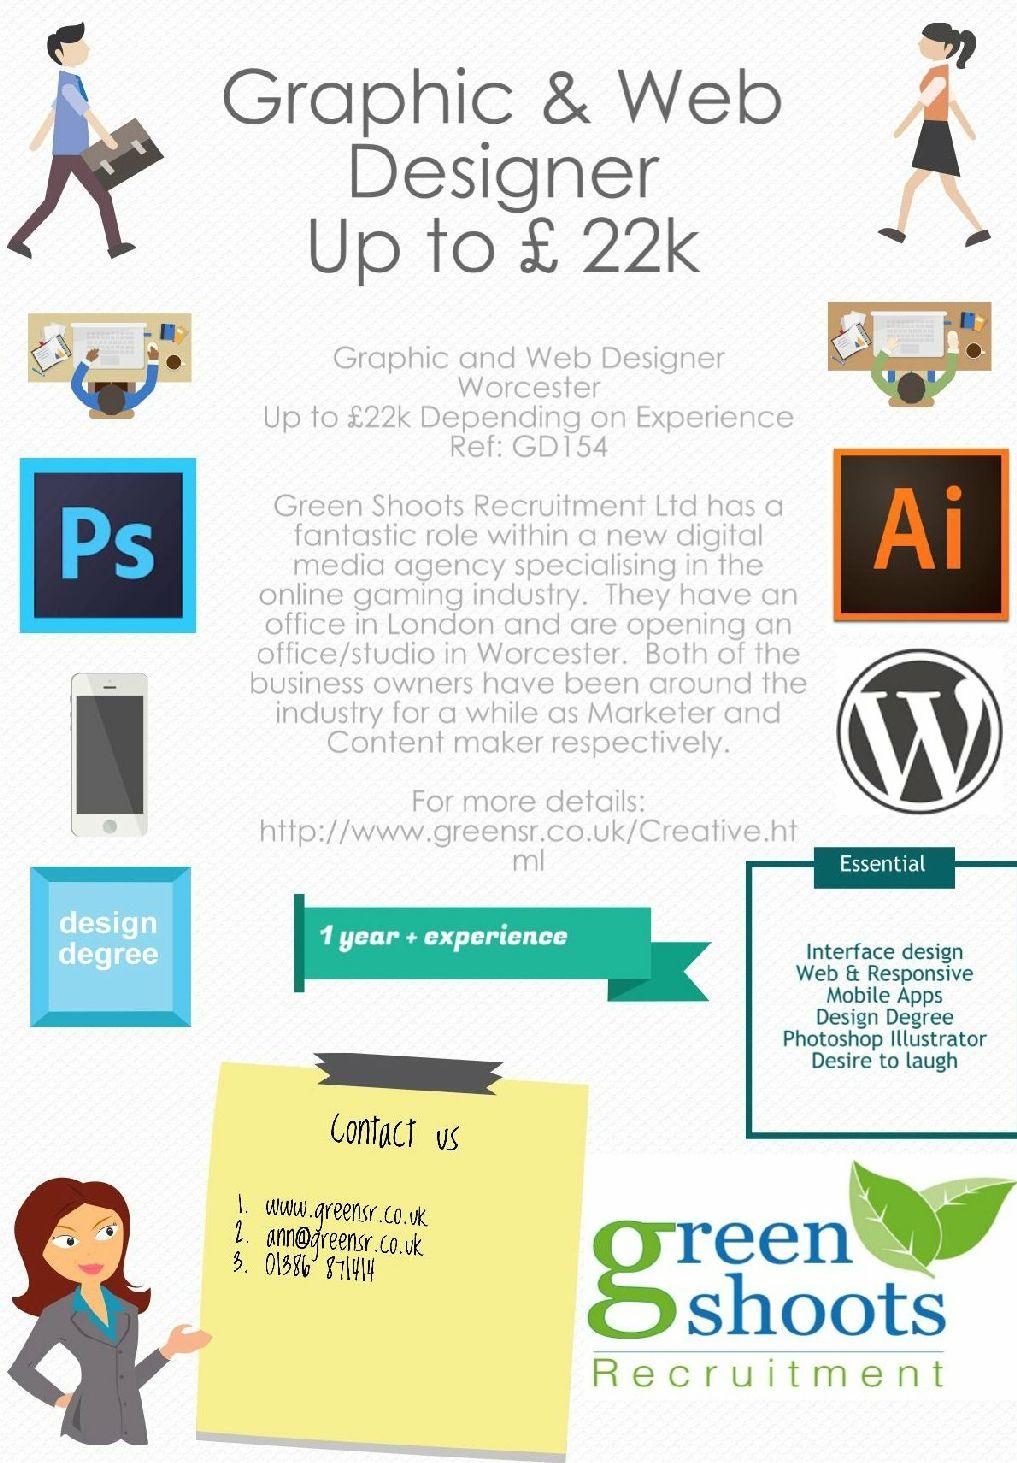 Graphic Web Designer Web Design Digital Jobs Web Design Jobs